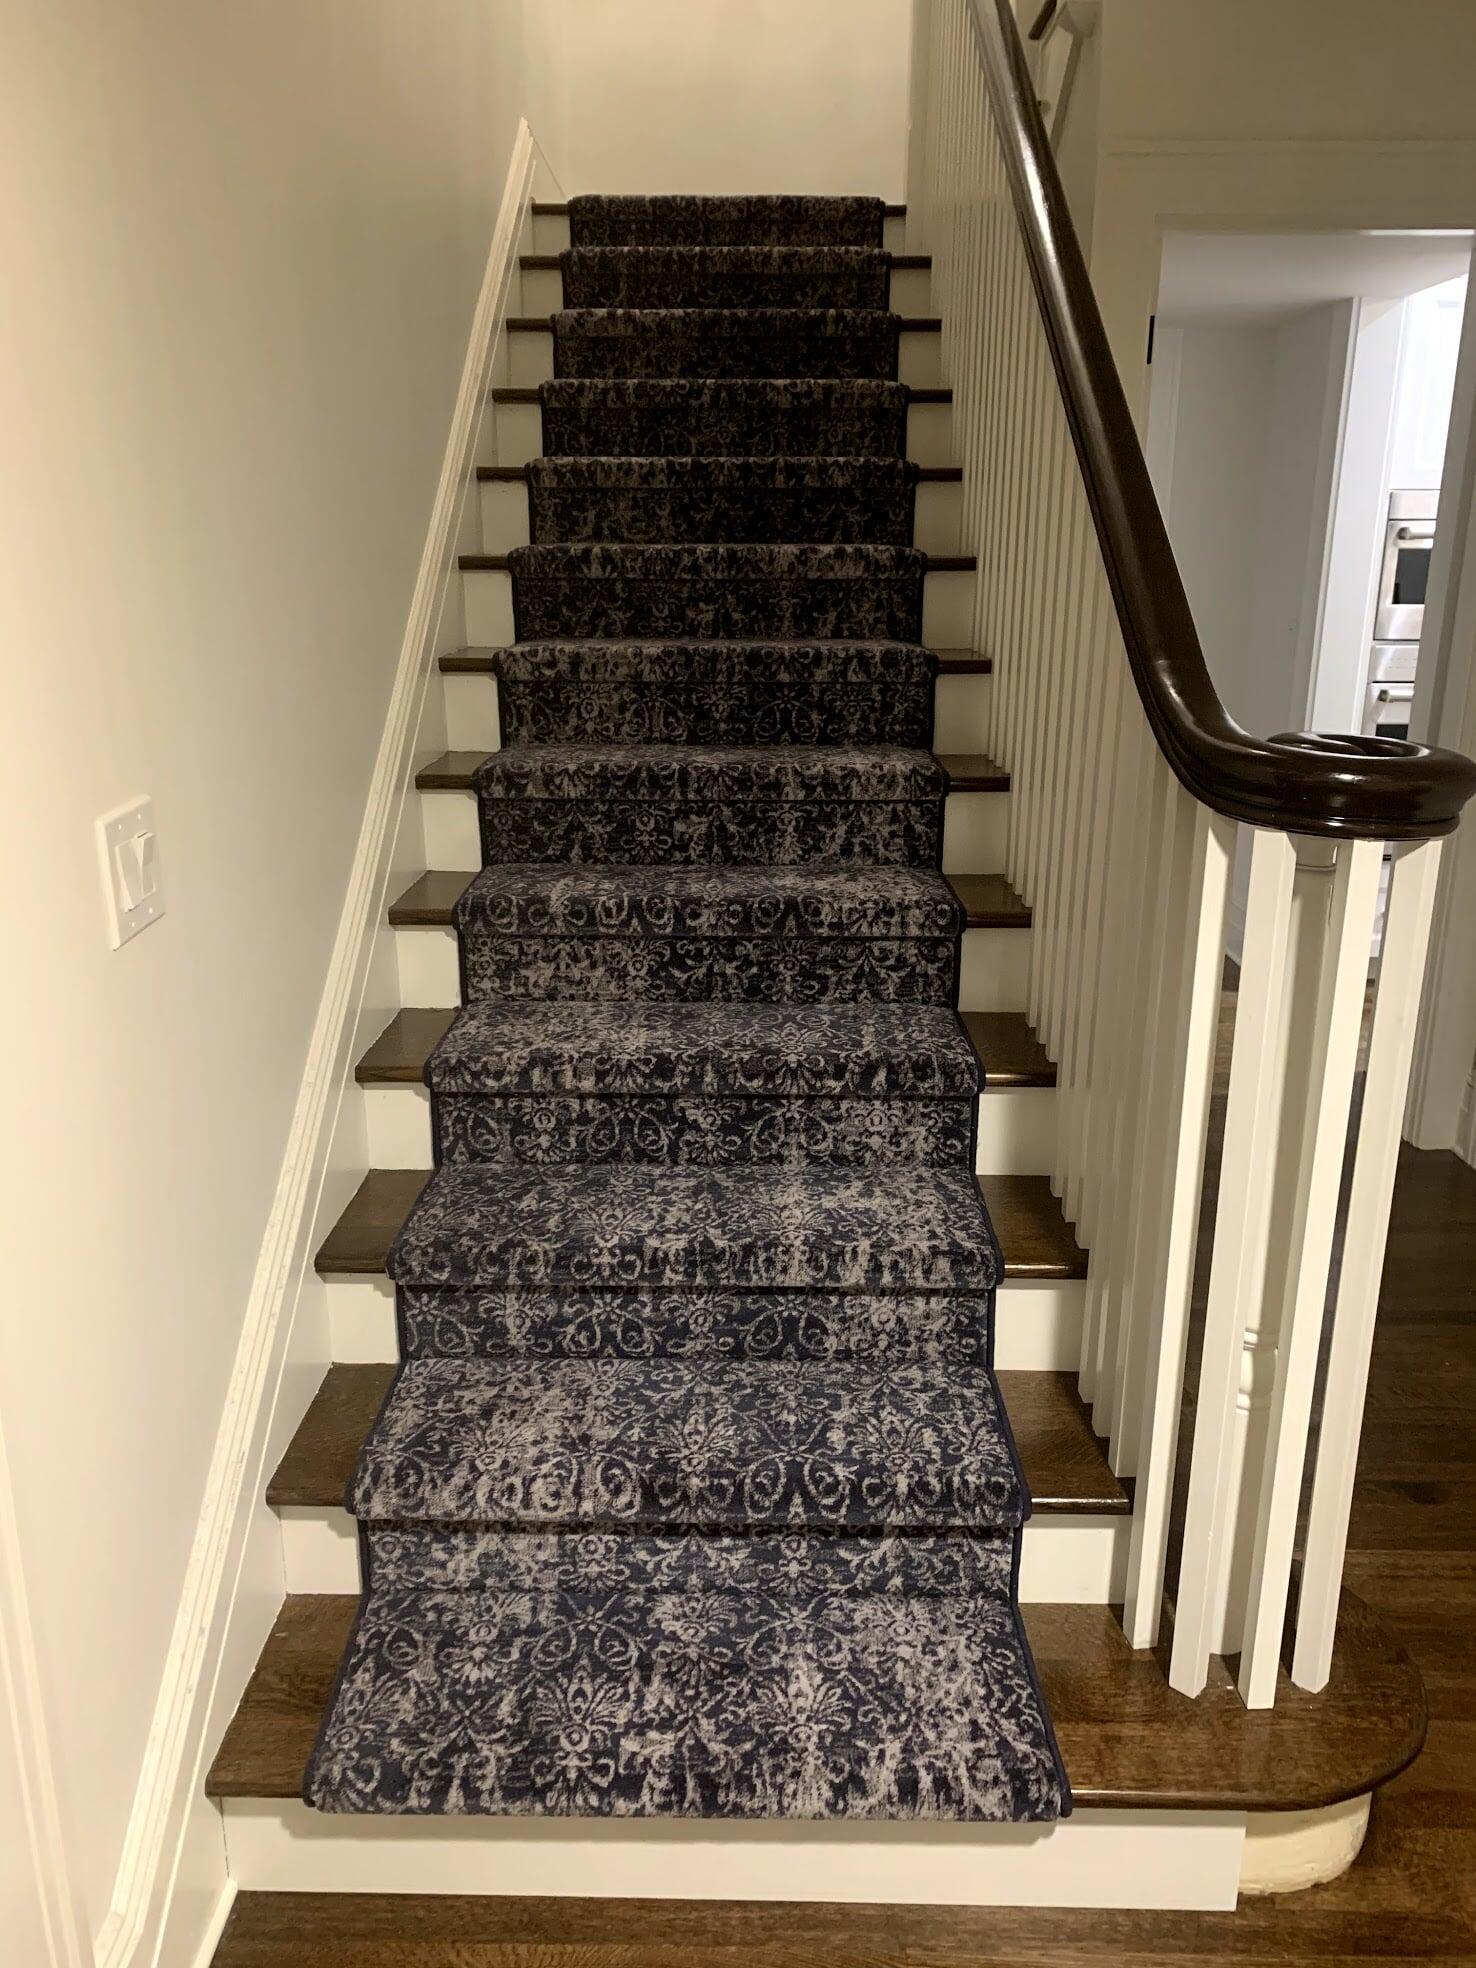 Carpet stair runner in Bellevue, WA from Vogel's Carpet & Flooring